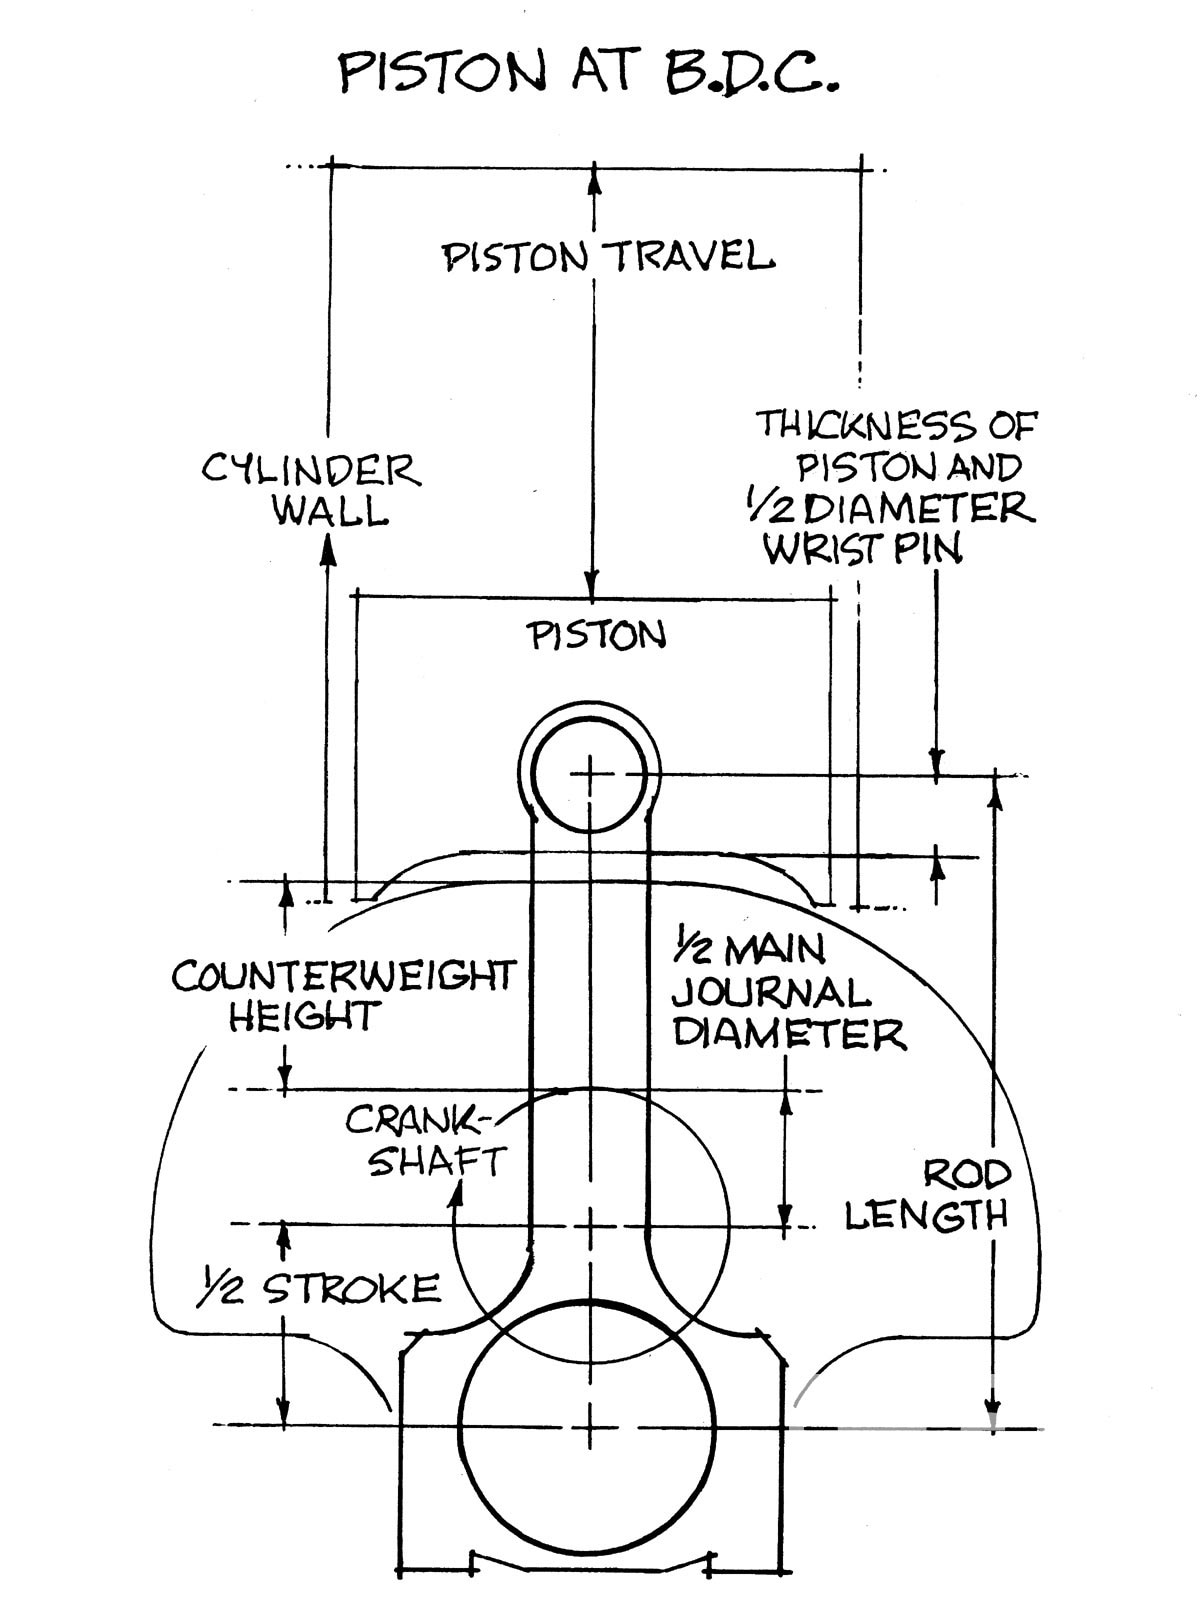 1964 chevy c10 fuse block diagram